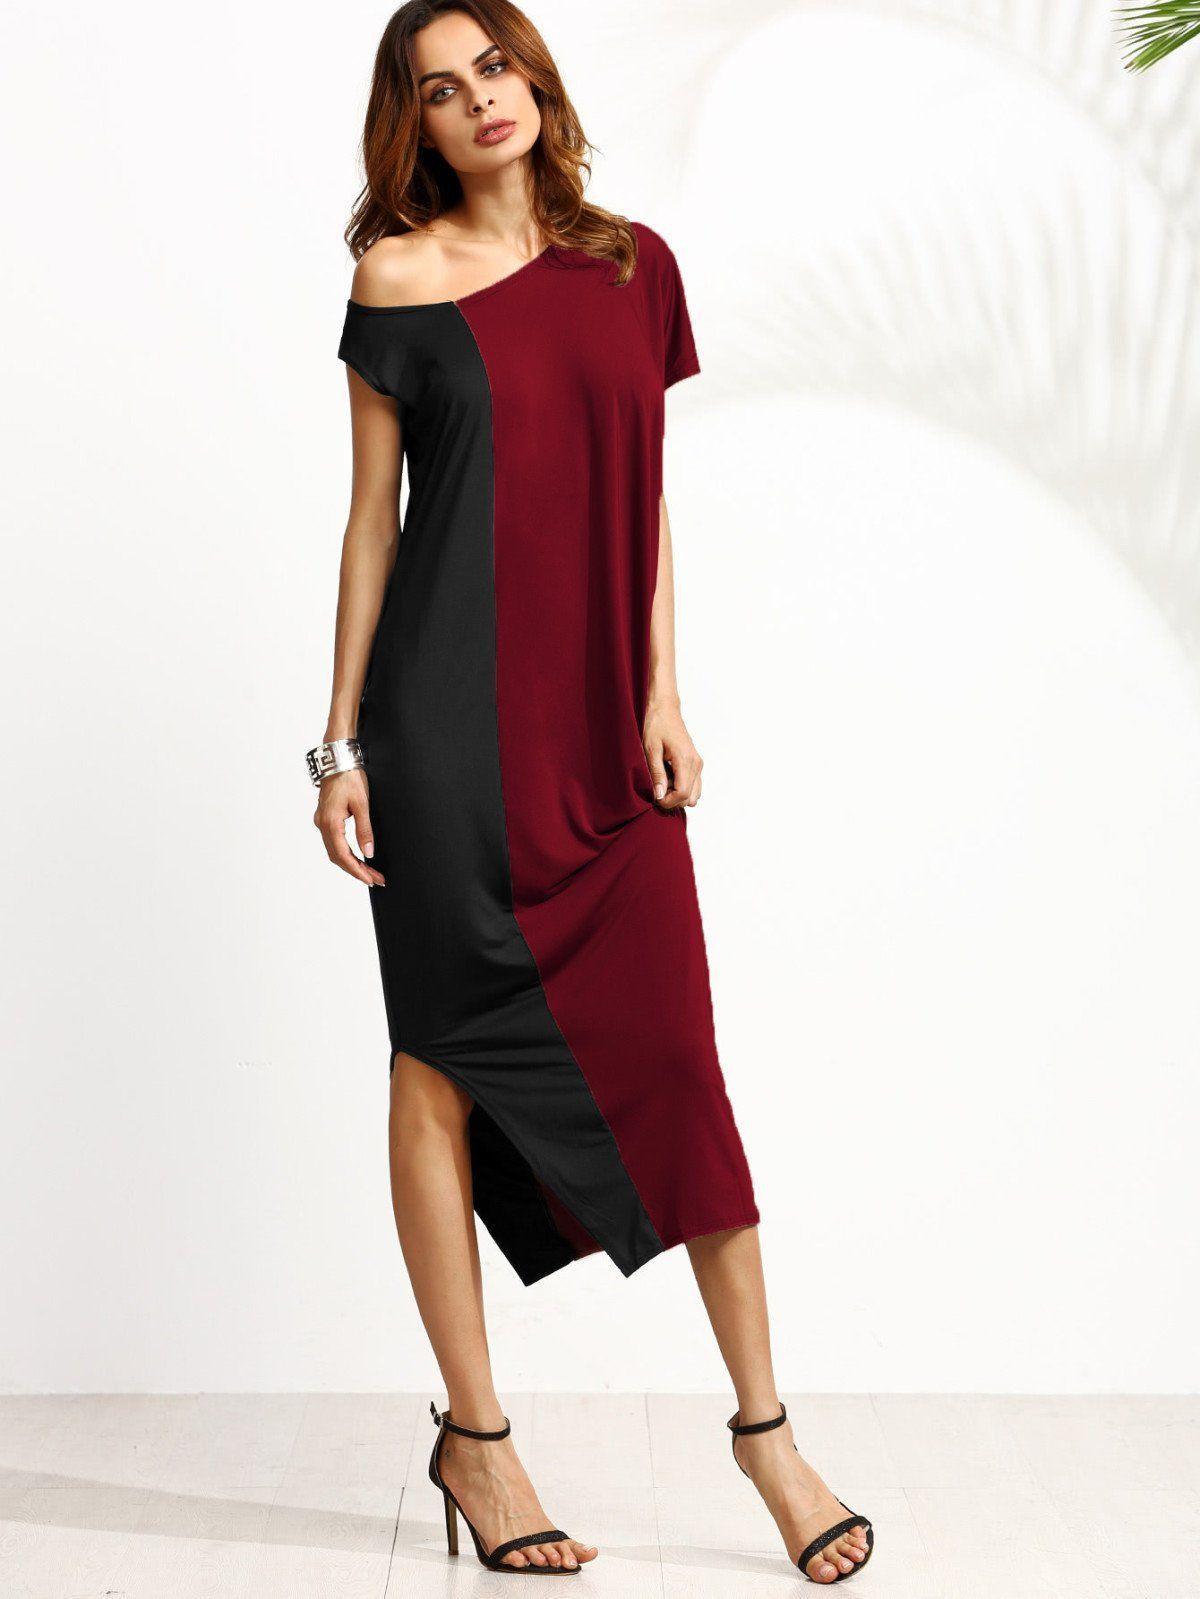 One side strap wedding dress  Two Tone Oblique Shoulder Split Dress  Think Print  Fashion